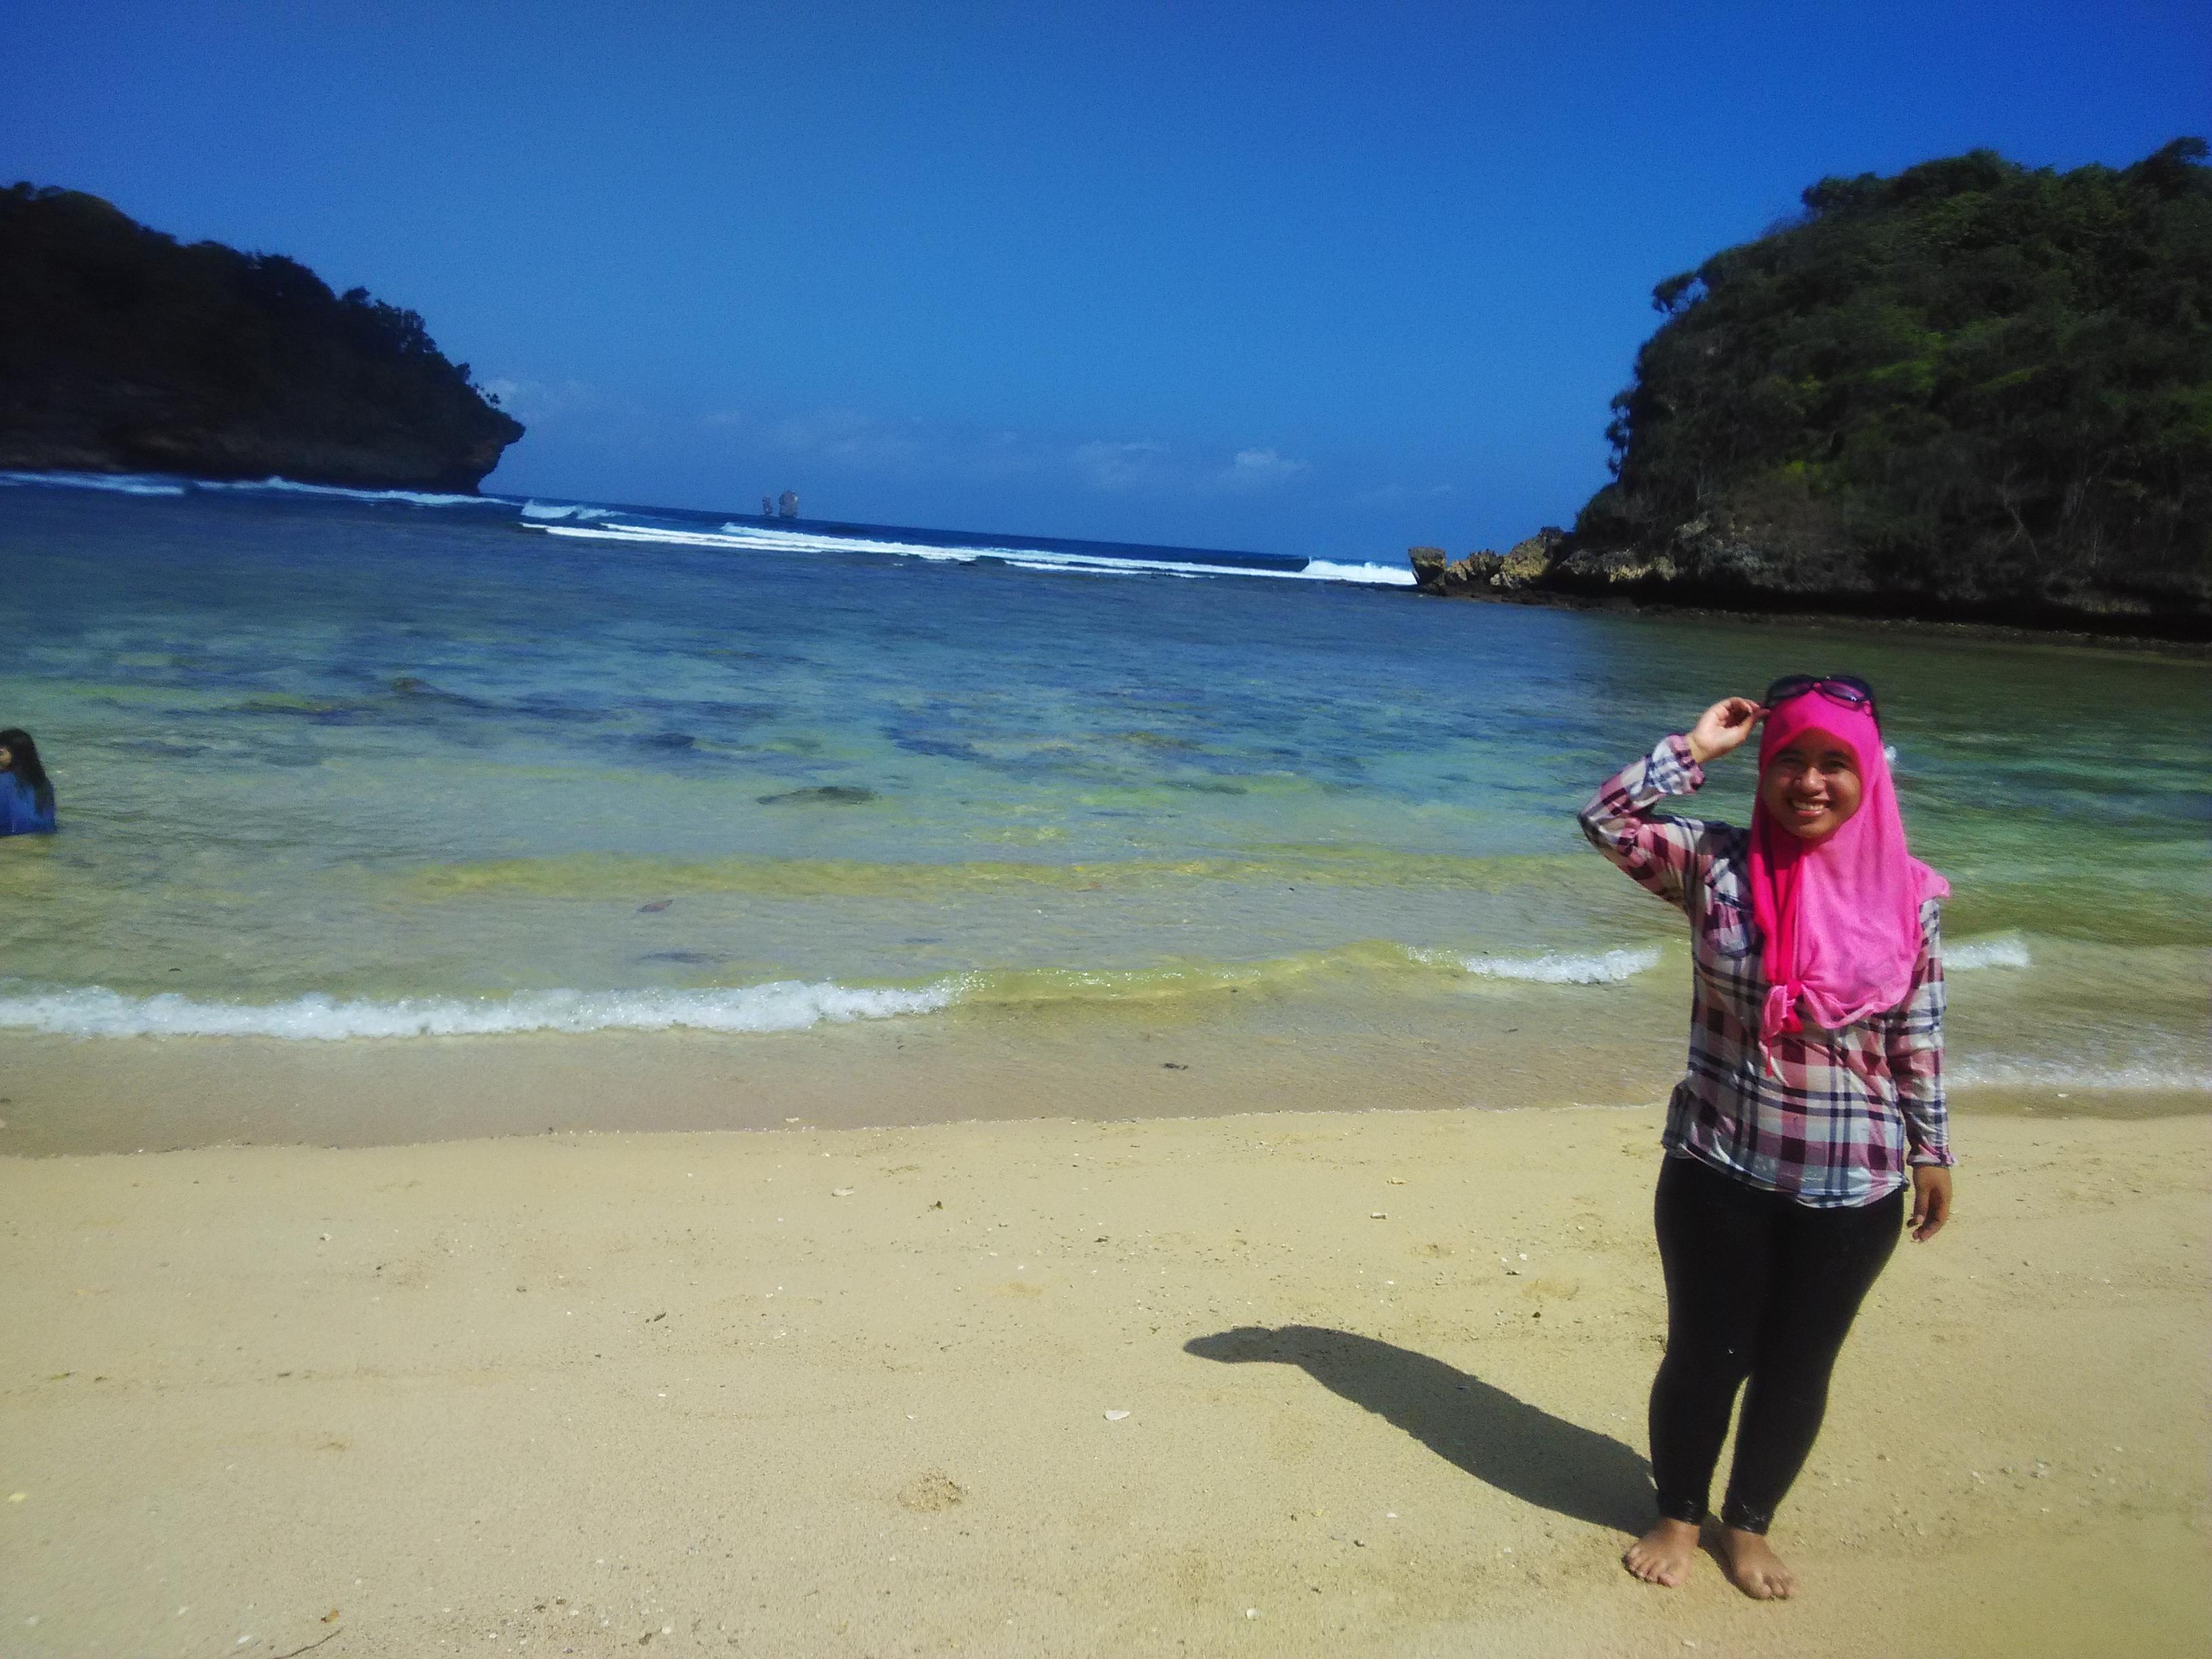 Holiday Trip Life Pesona Pantai Gatra Img 20150729 131448 Clungup